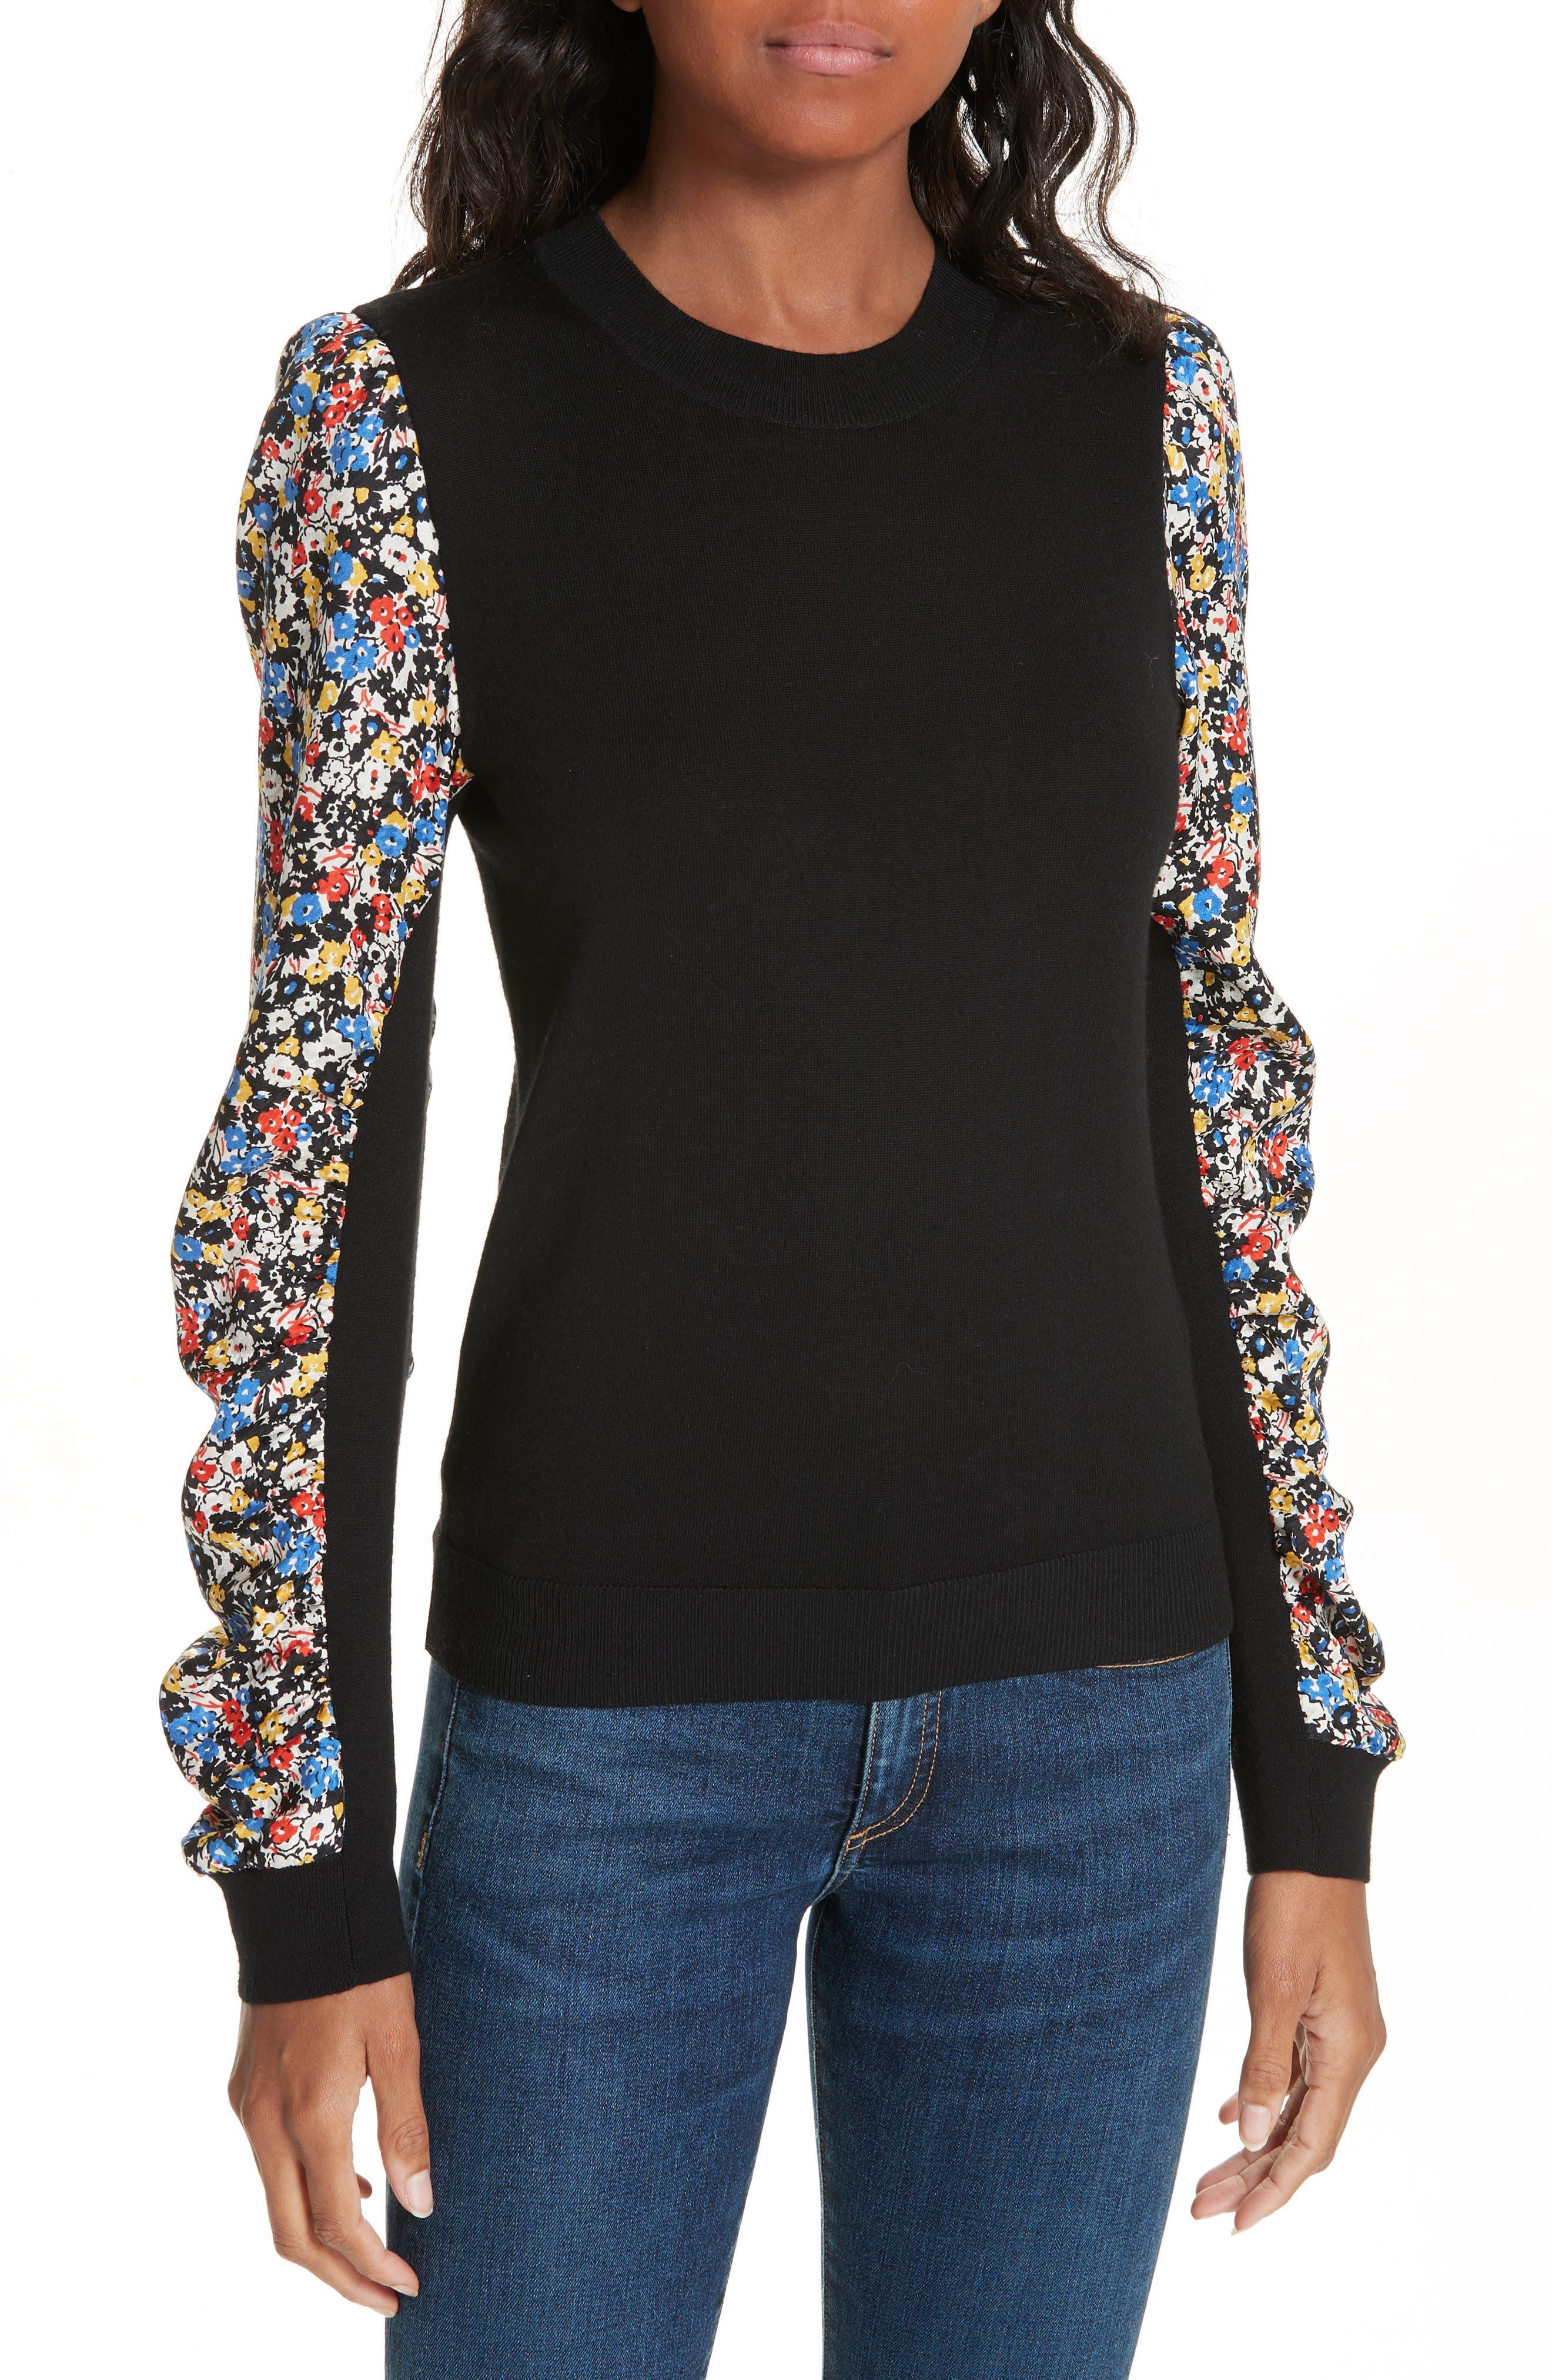 Adler Stretch Silk Sleeve Merino Wool Sweater,                             Main thumbnail 1, color,                             BLACK FLORAL